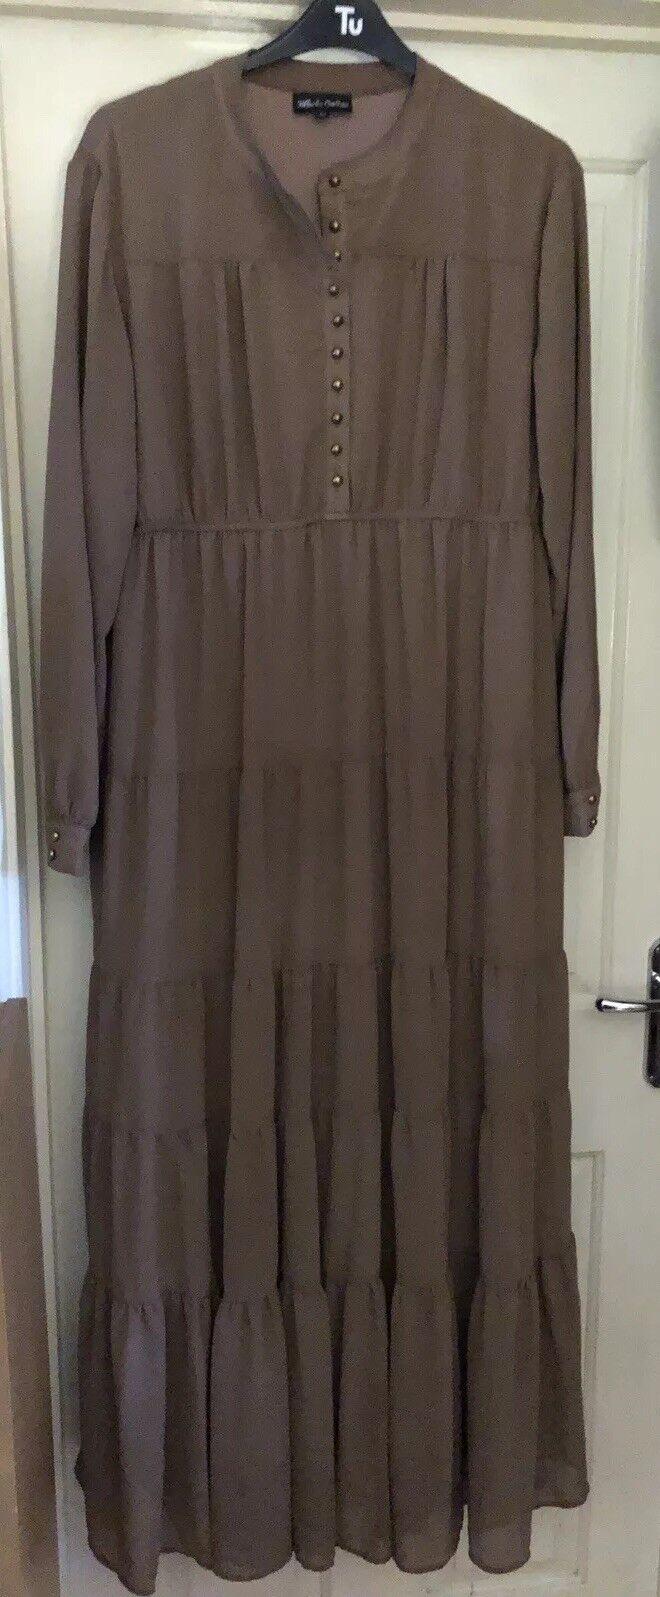 Jibabs Online Brown Abaya  Dress, Size 18-20 - Stunning